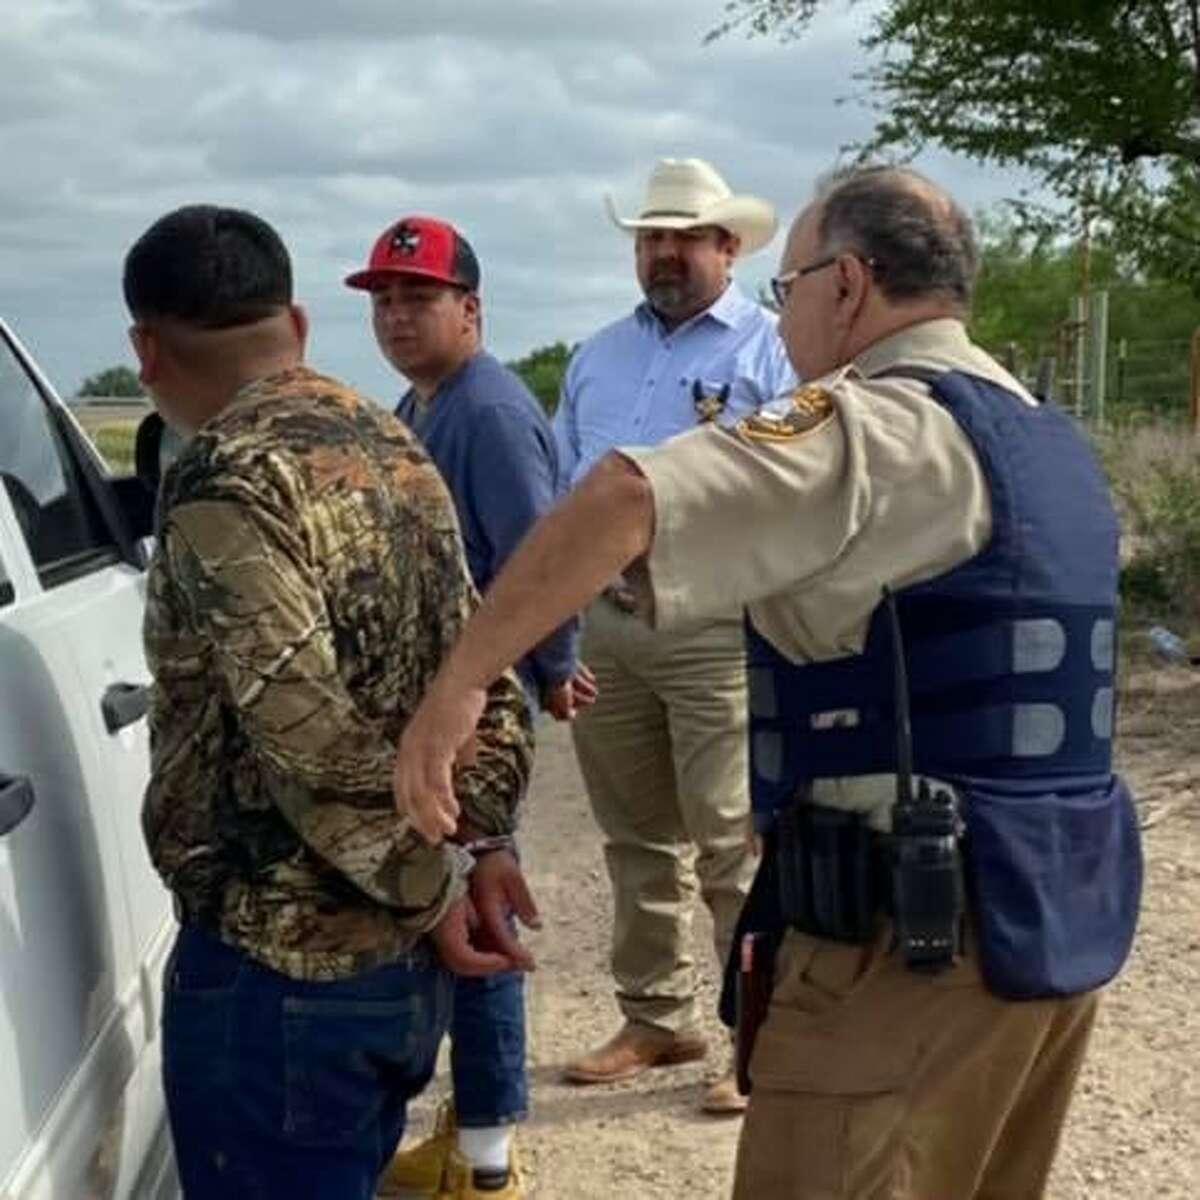 Zapata County Sheriff Raymundo Del Bosque Jr. apprehended two migrants while patrolling North U.S. 83.